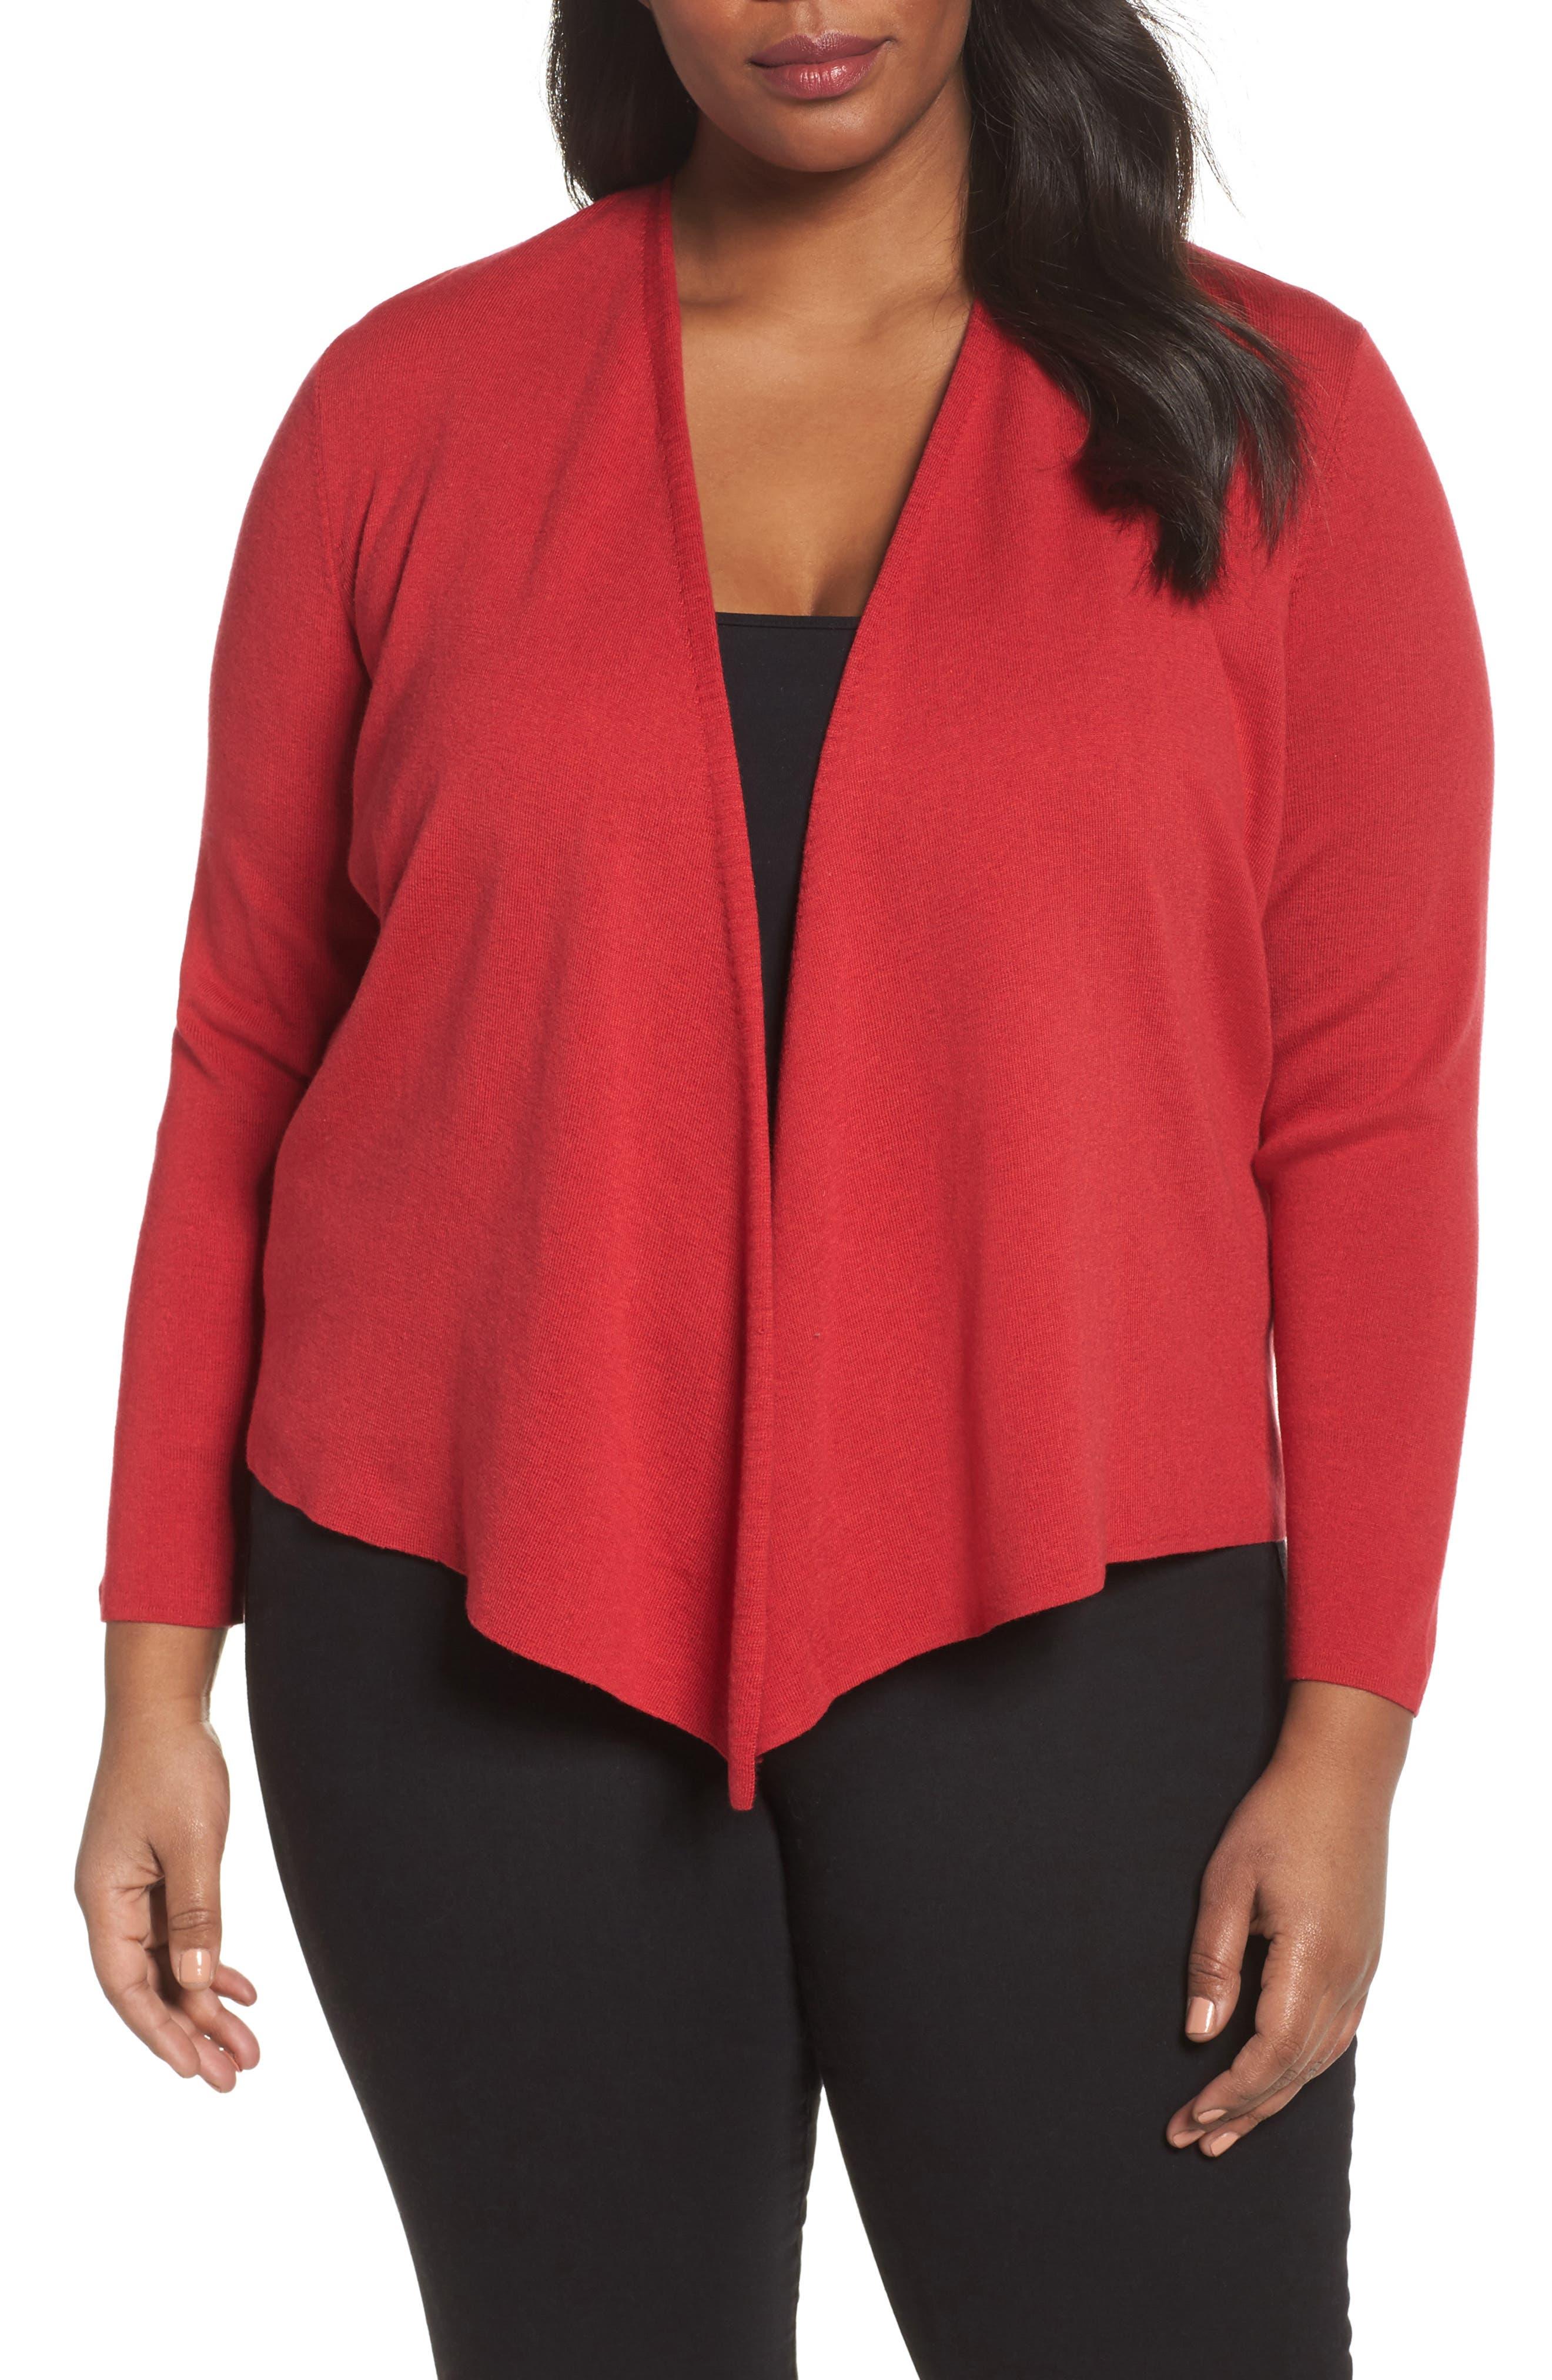 4-Way Convertible Cardigan,                         Main,                         color, True Red